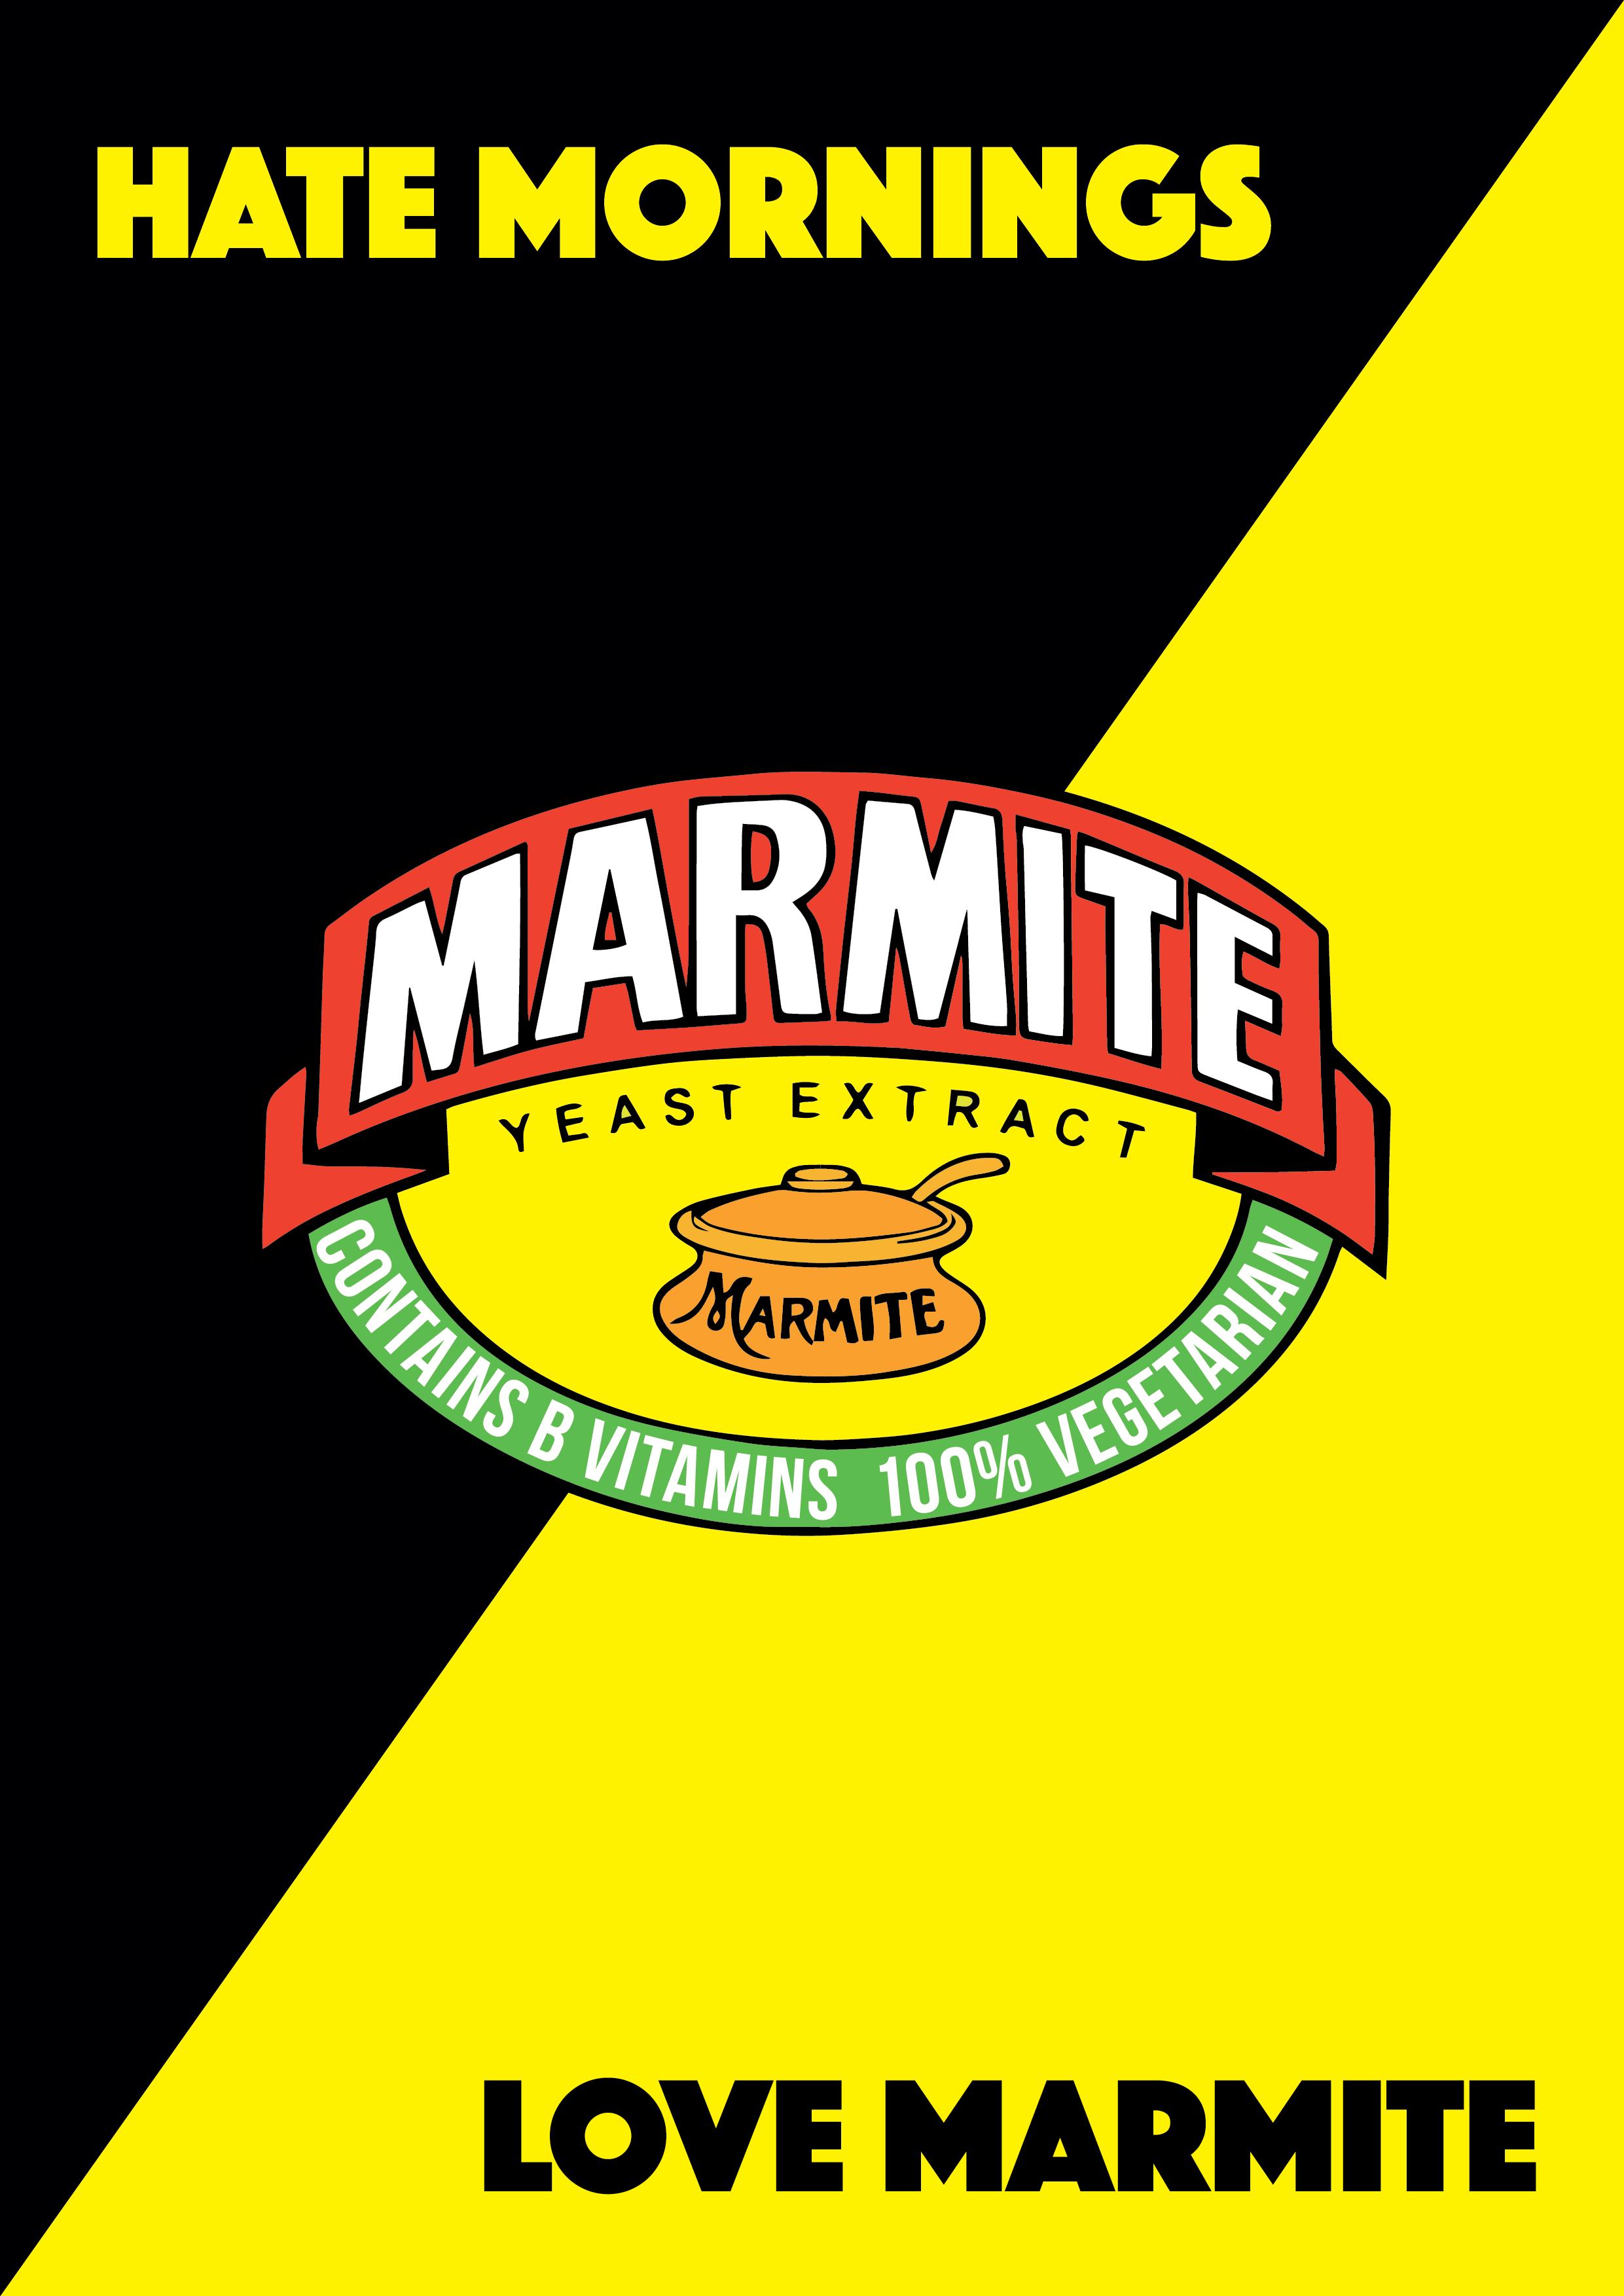 Marmate-03.png